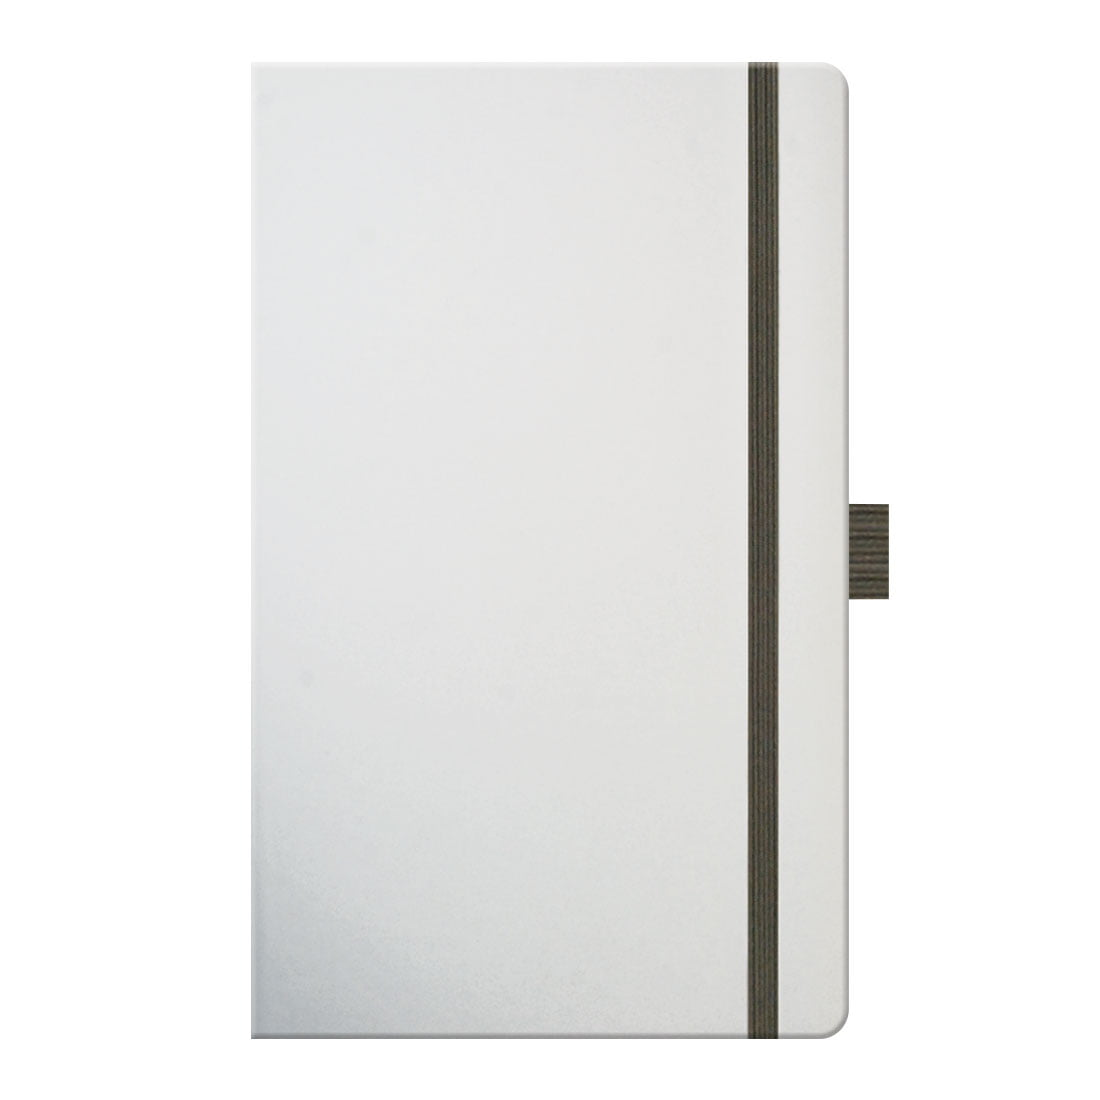 Castelli Branded Matra Large Notebook  Executive Gifts UK